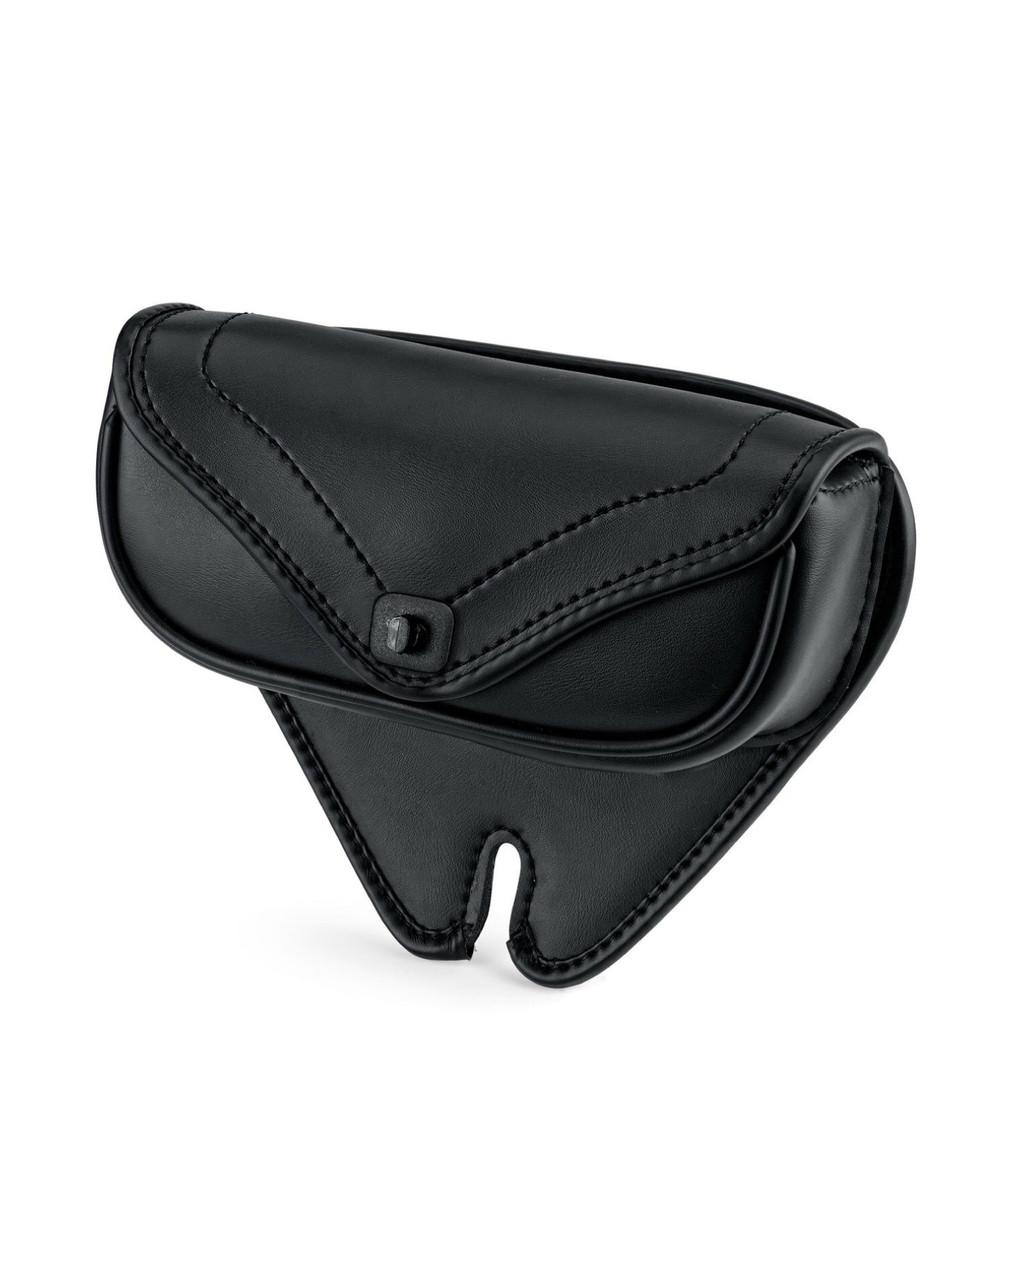 Suzuki Viking Plain Motorcycle Windshield Bag Main Bag View